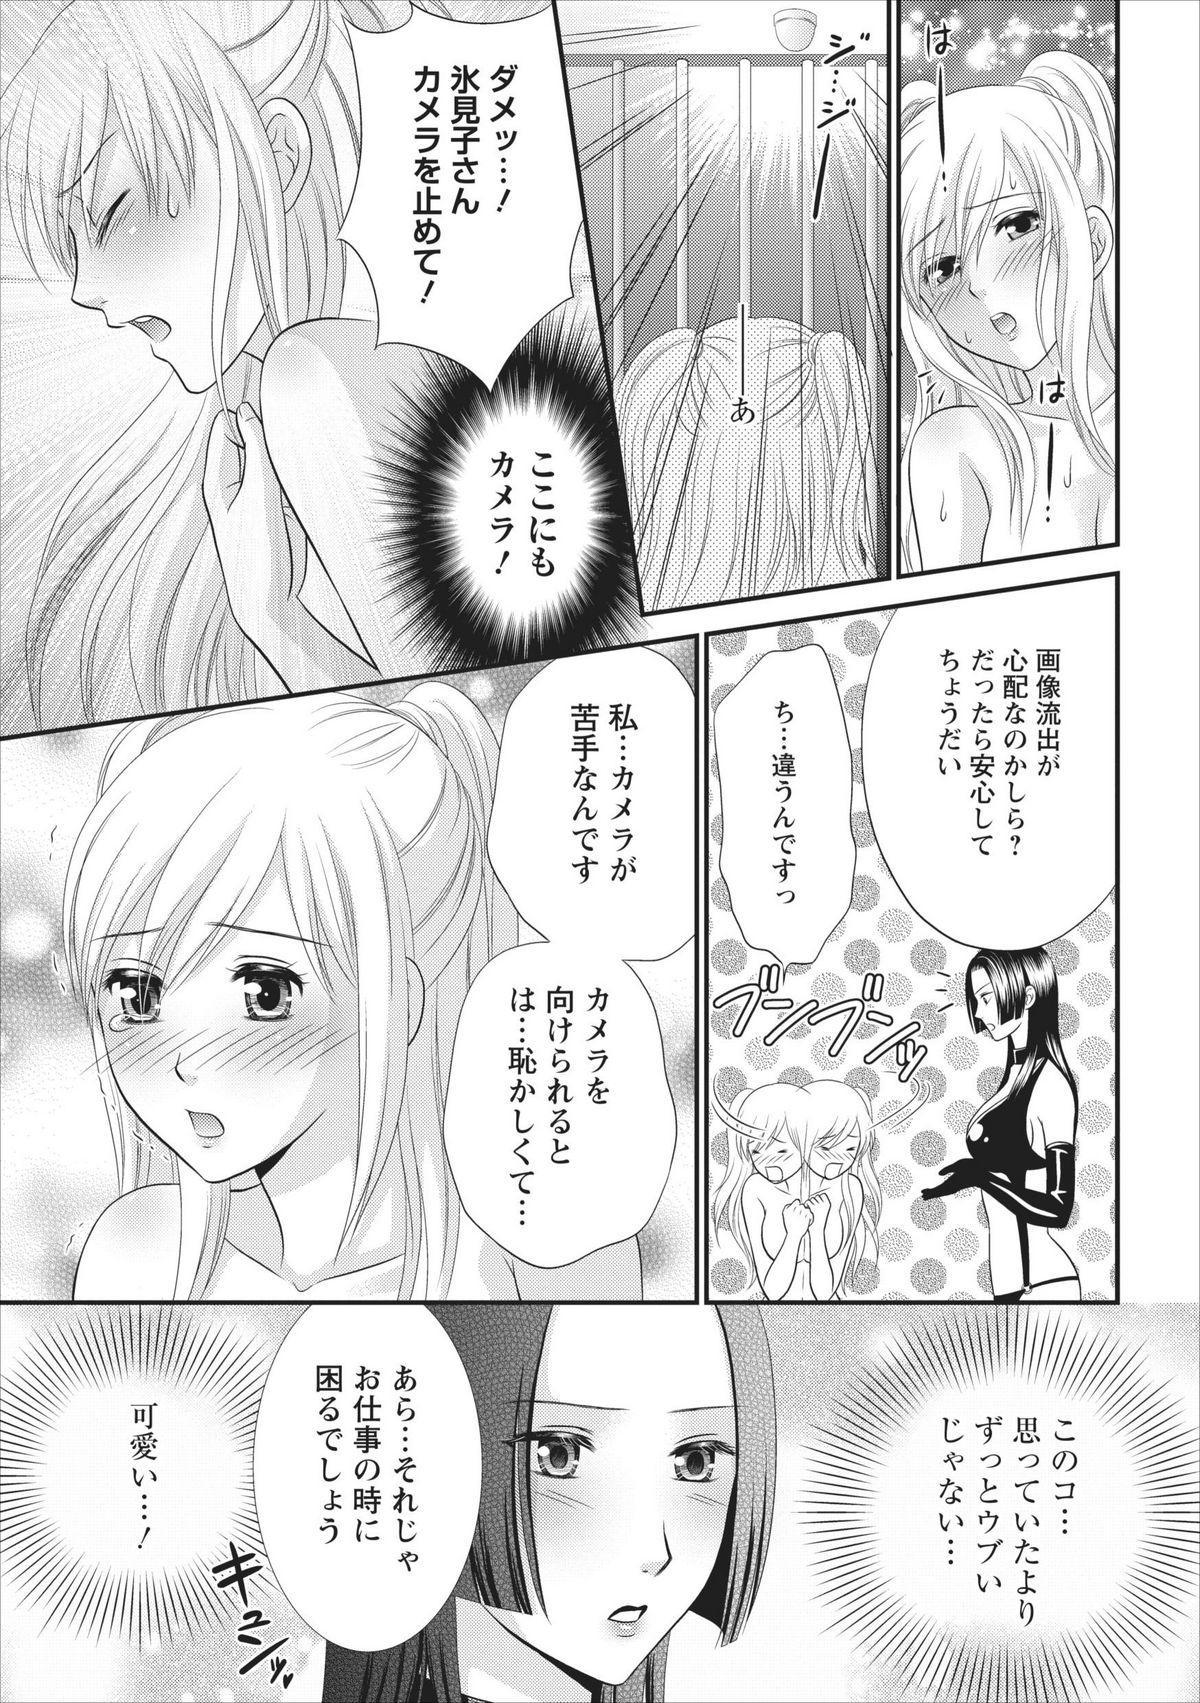 Himitsu Club Himiko - Inwai Kan no Joou ch.2 14